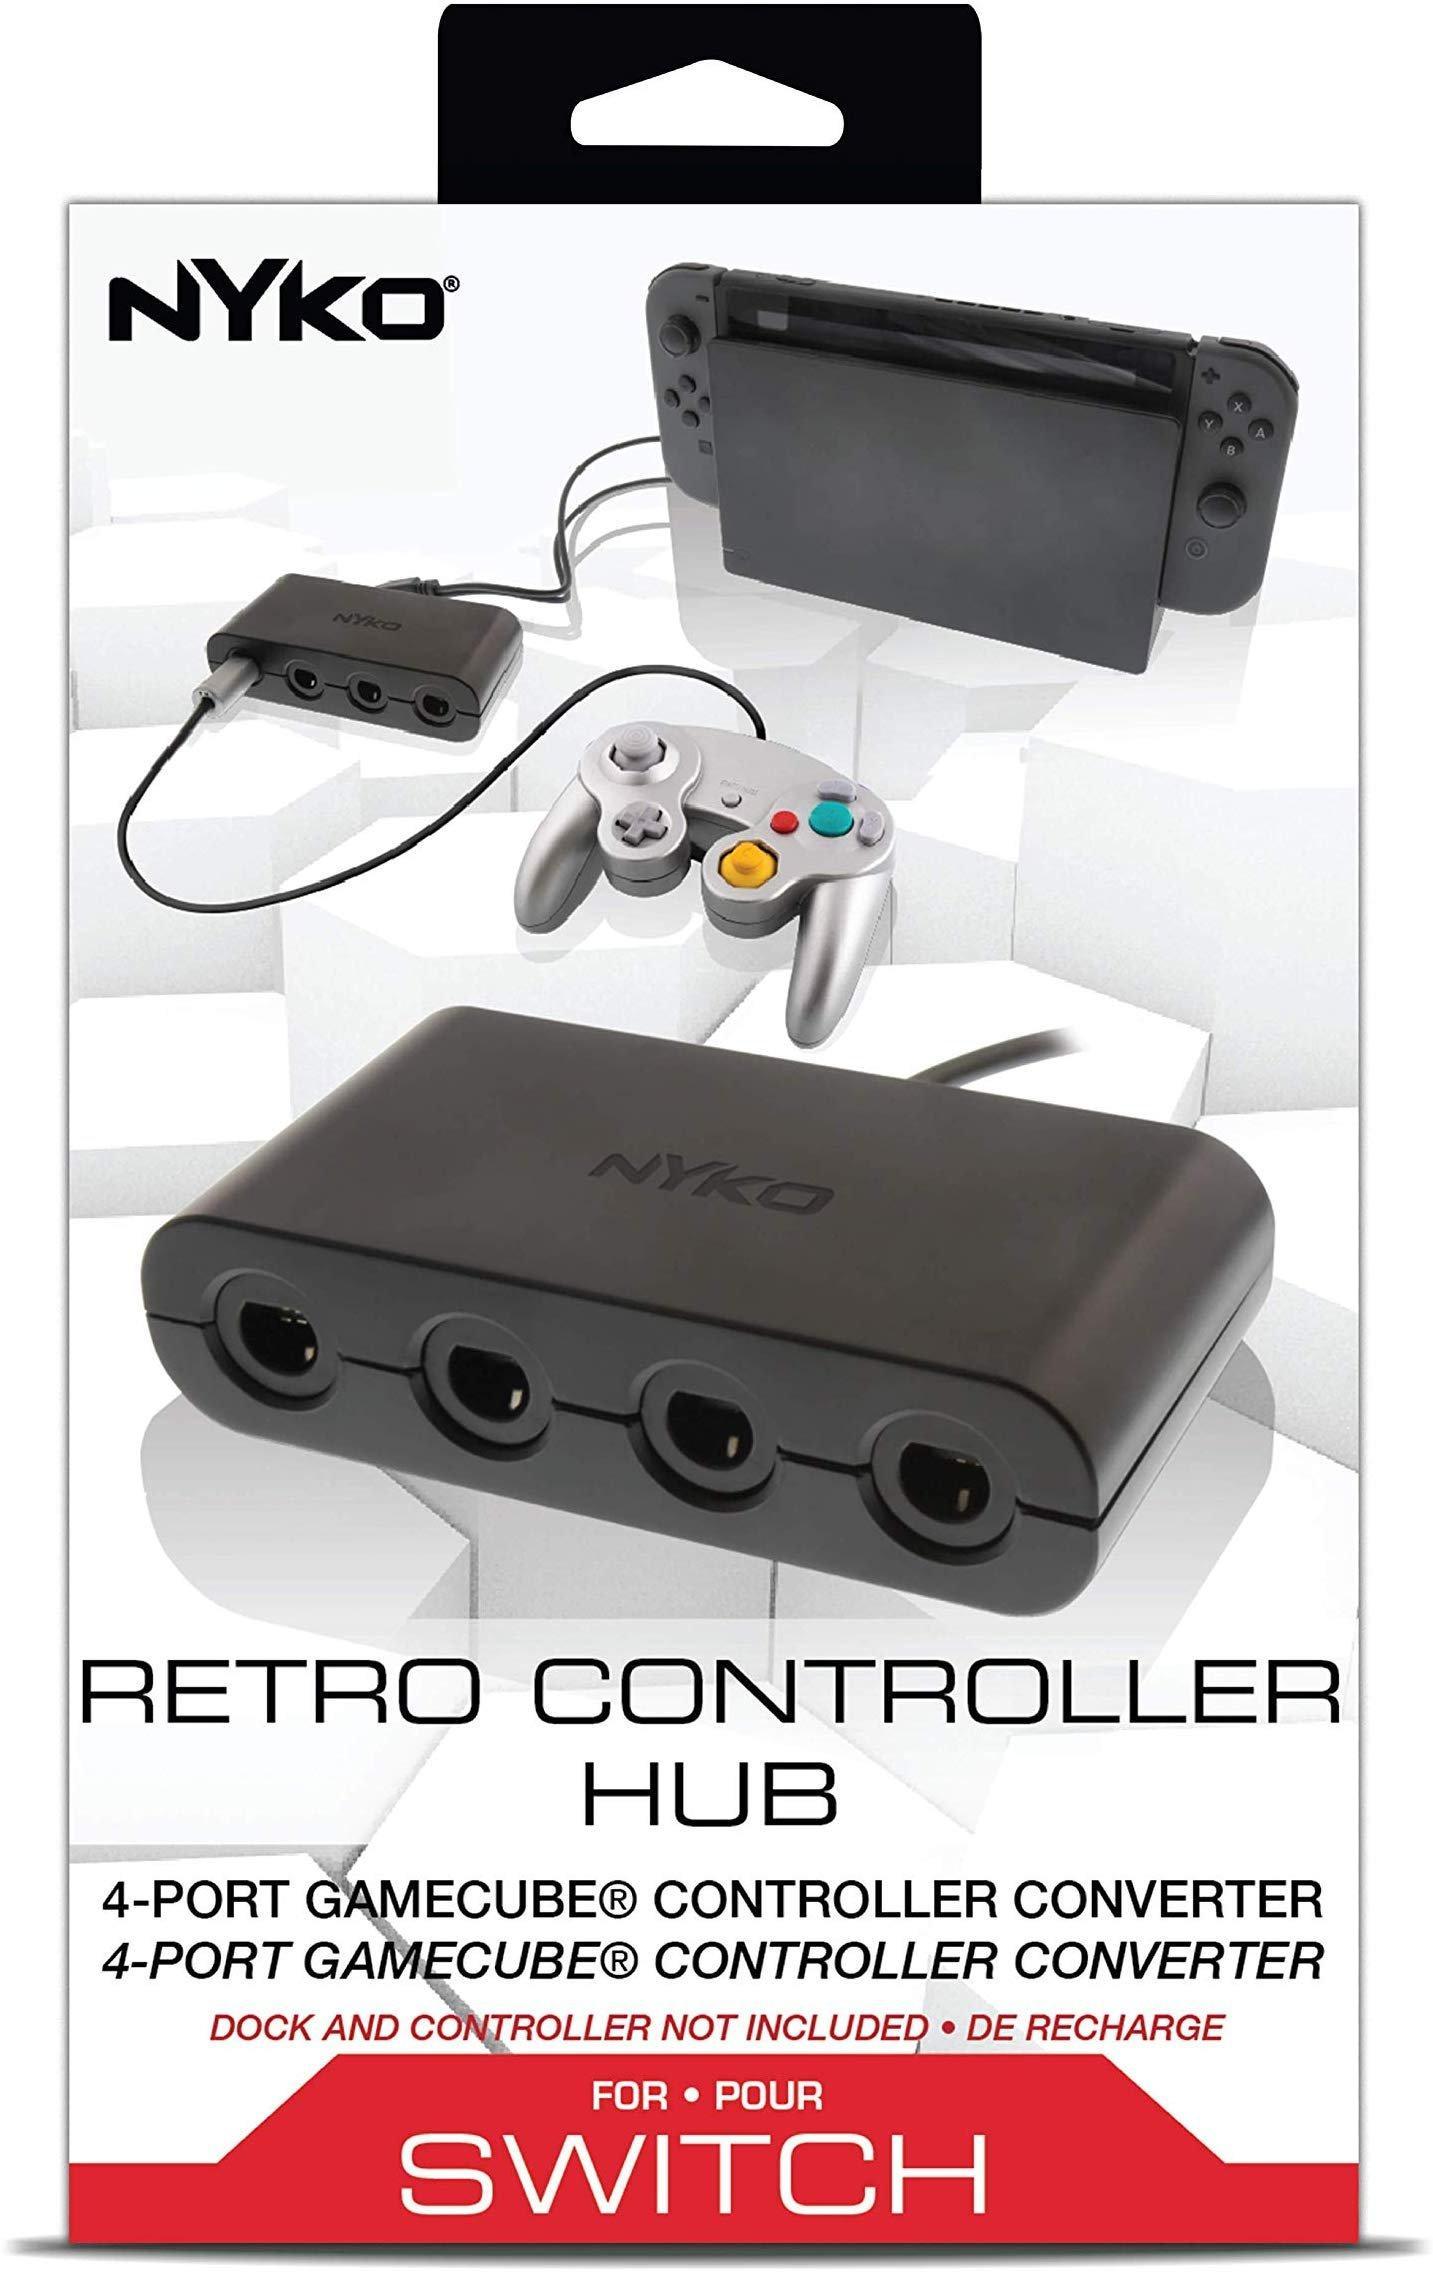 Playstation 3 Controller Wiring Diagram On Nintendo Controller Wiring